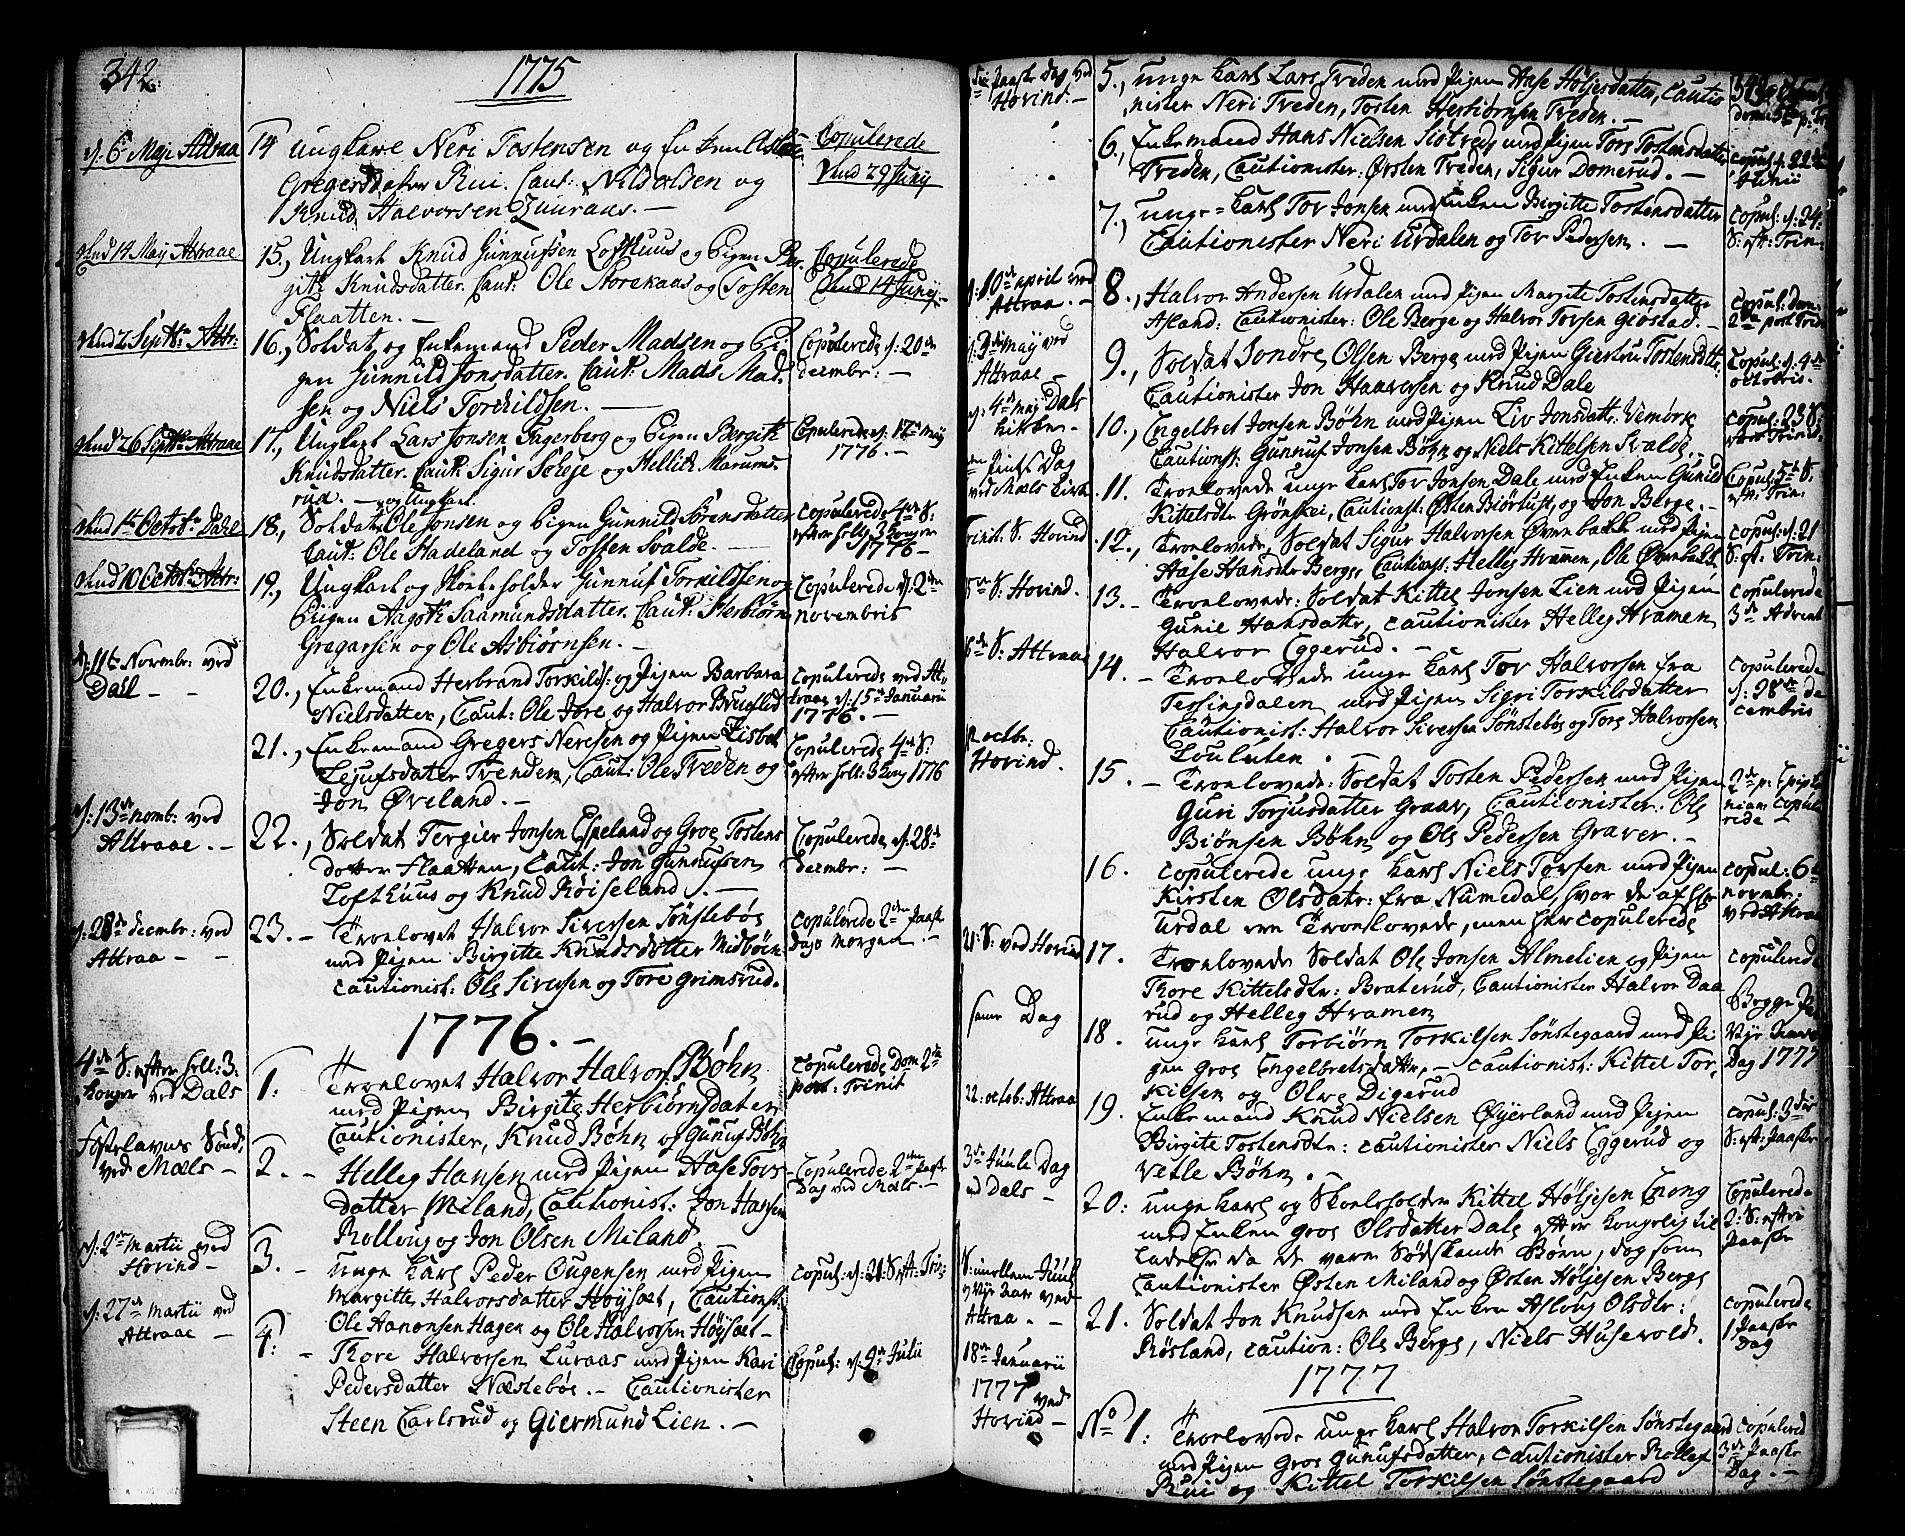 SAKO, Tinn kirkebøker, F/Fa/L0002: Ministerialbok nr. I 2, 1757-1810, s. 342-343